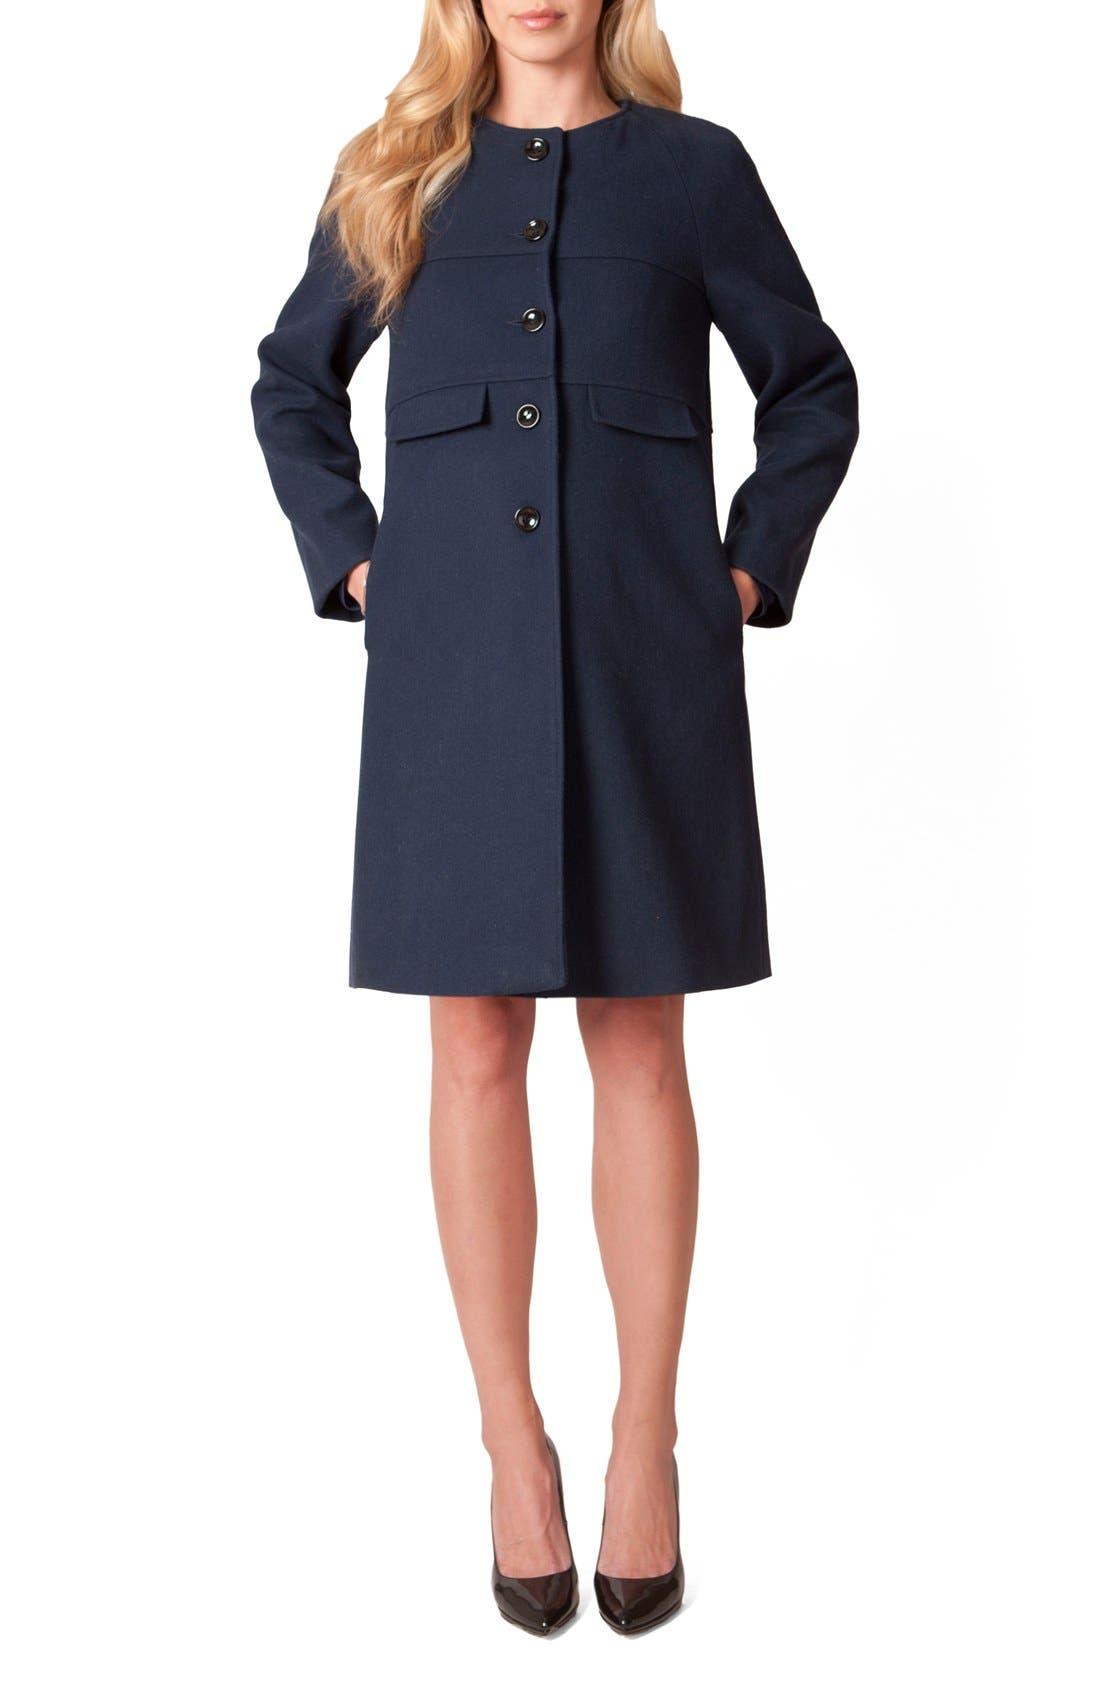 Main Image - Seraphine Celine Maternity Coat